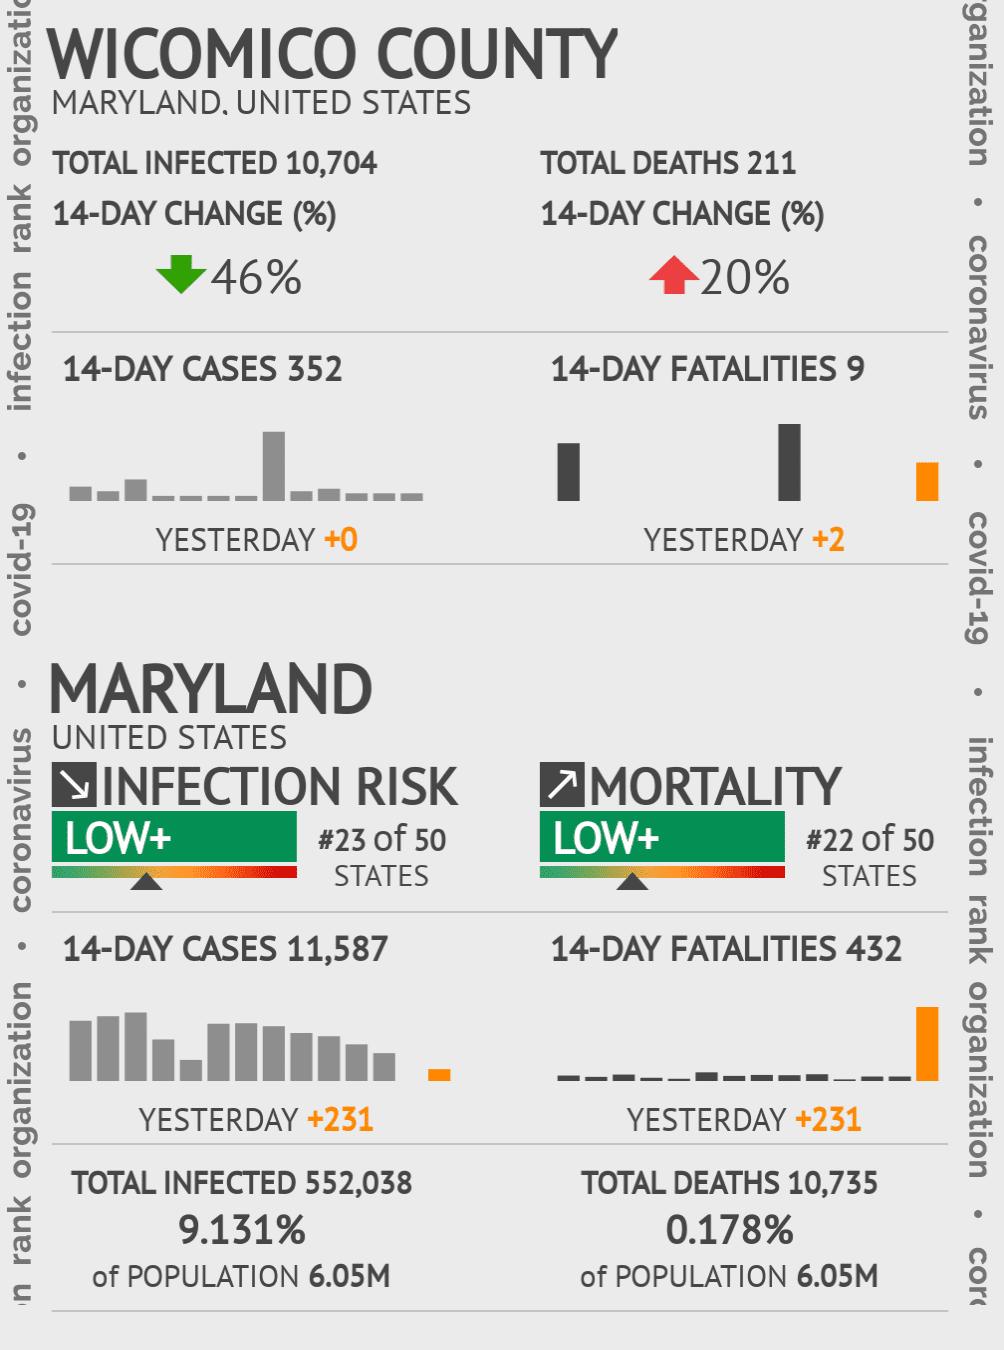 Wicomico County Coronavirus Covid-19 Risk of Infection on July 24, 2021